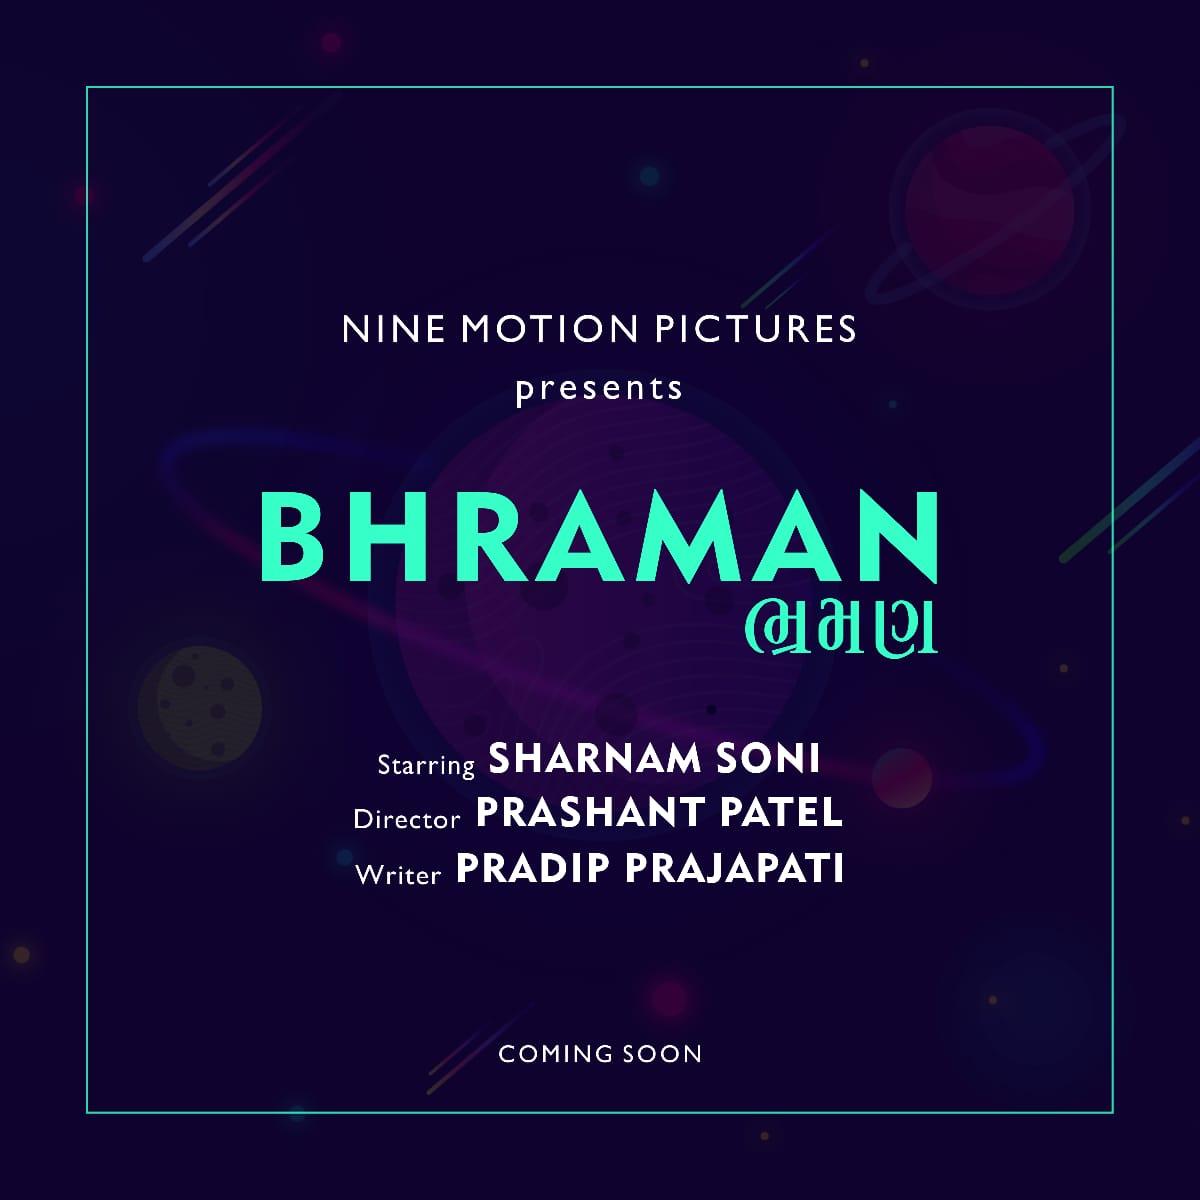 bhraman hashtag on Twitter